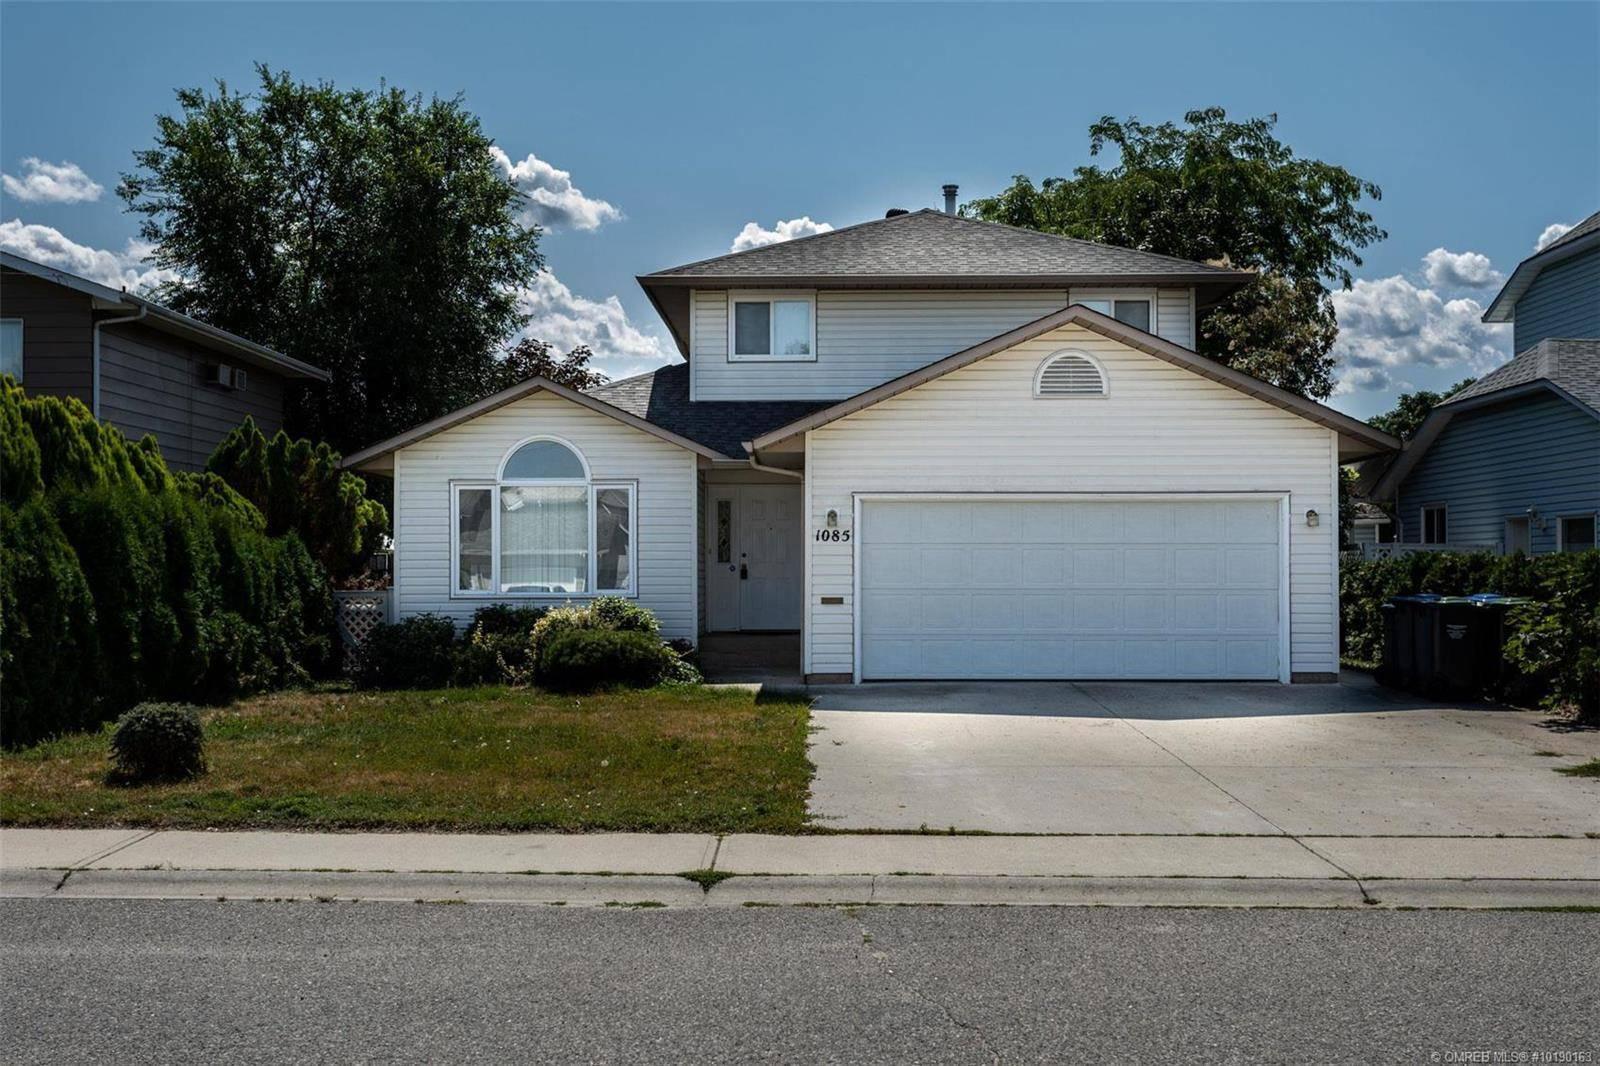 House for sale at 1085 Elwyn Rd Kelowna British Columbia - MLS: 10190163